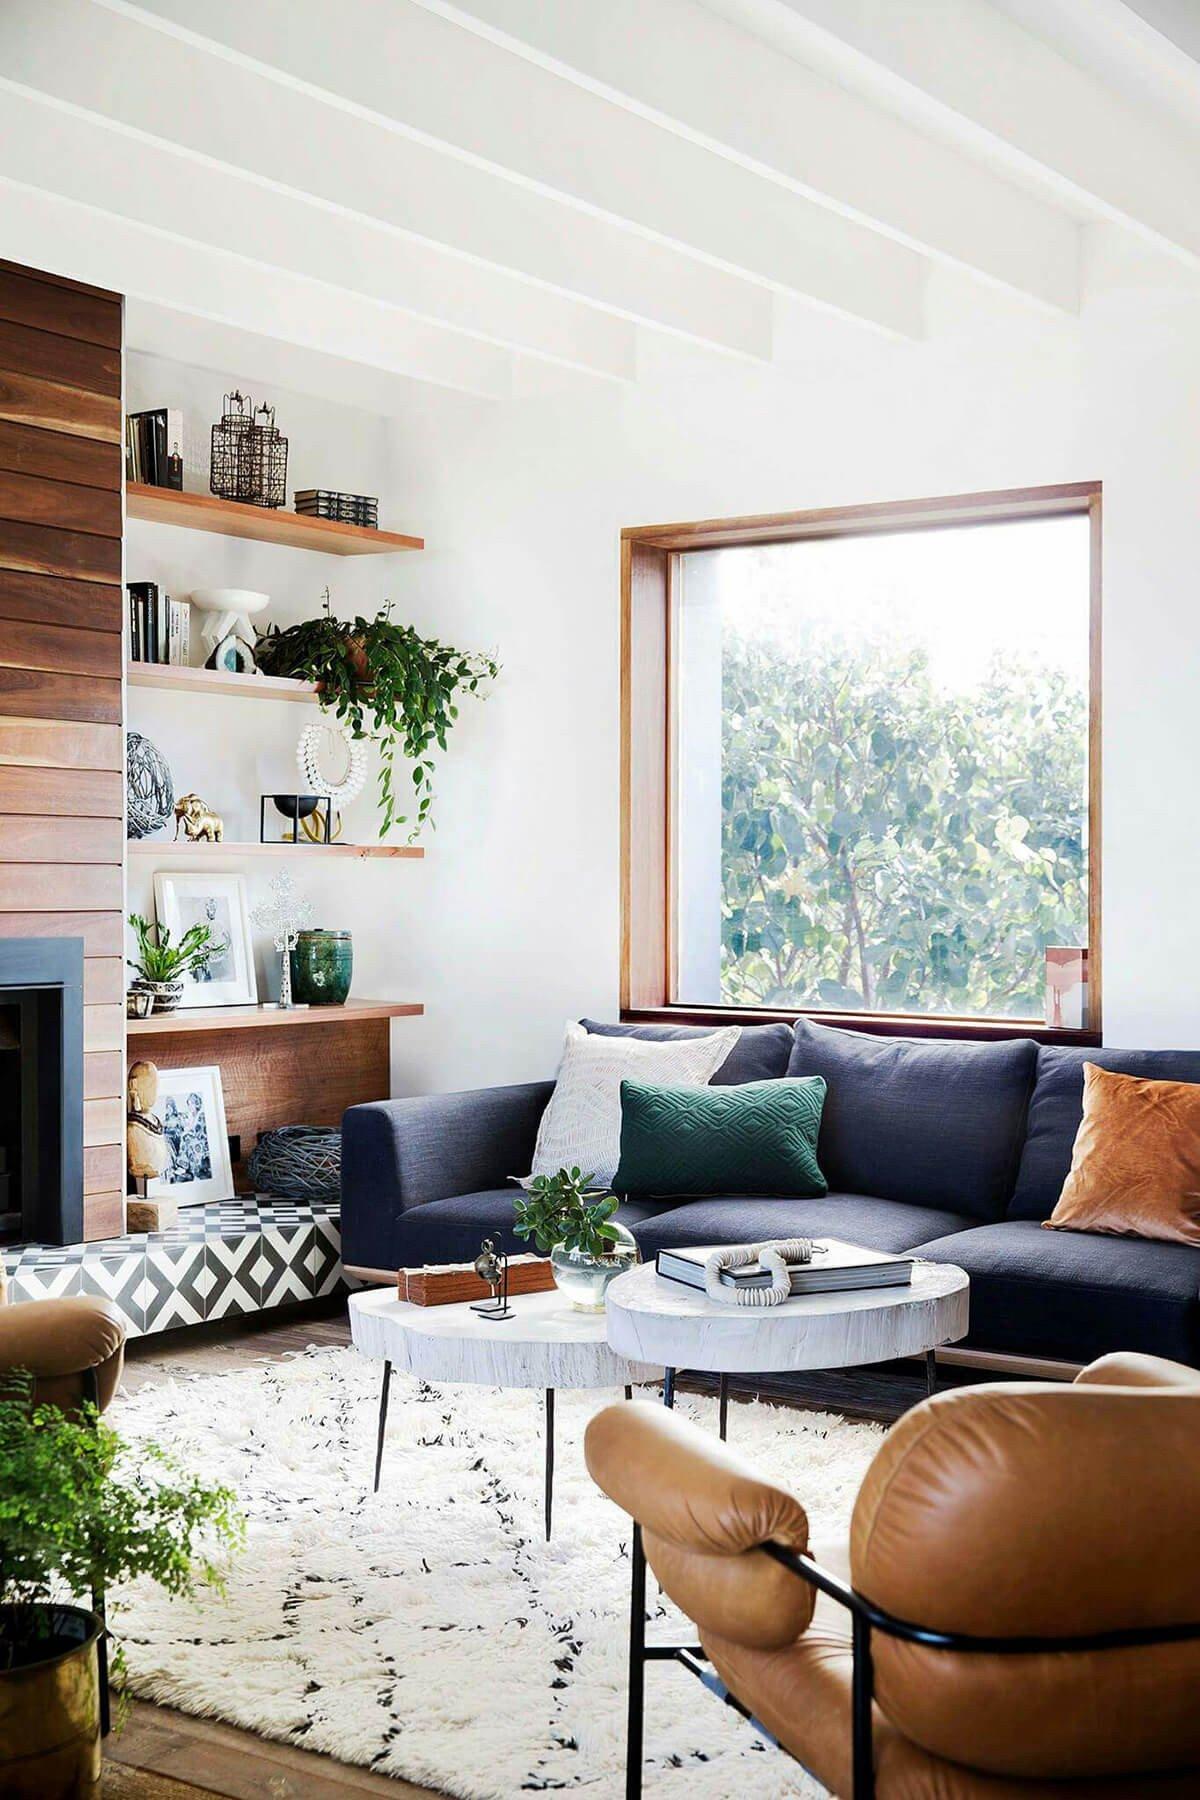 Modern Blue Living Room Decorating Ideas Fresh 26 Best Modern Living Room Decorating Ideas and Designs for 2019